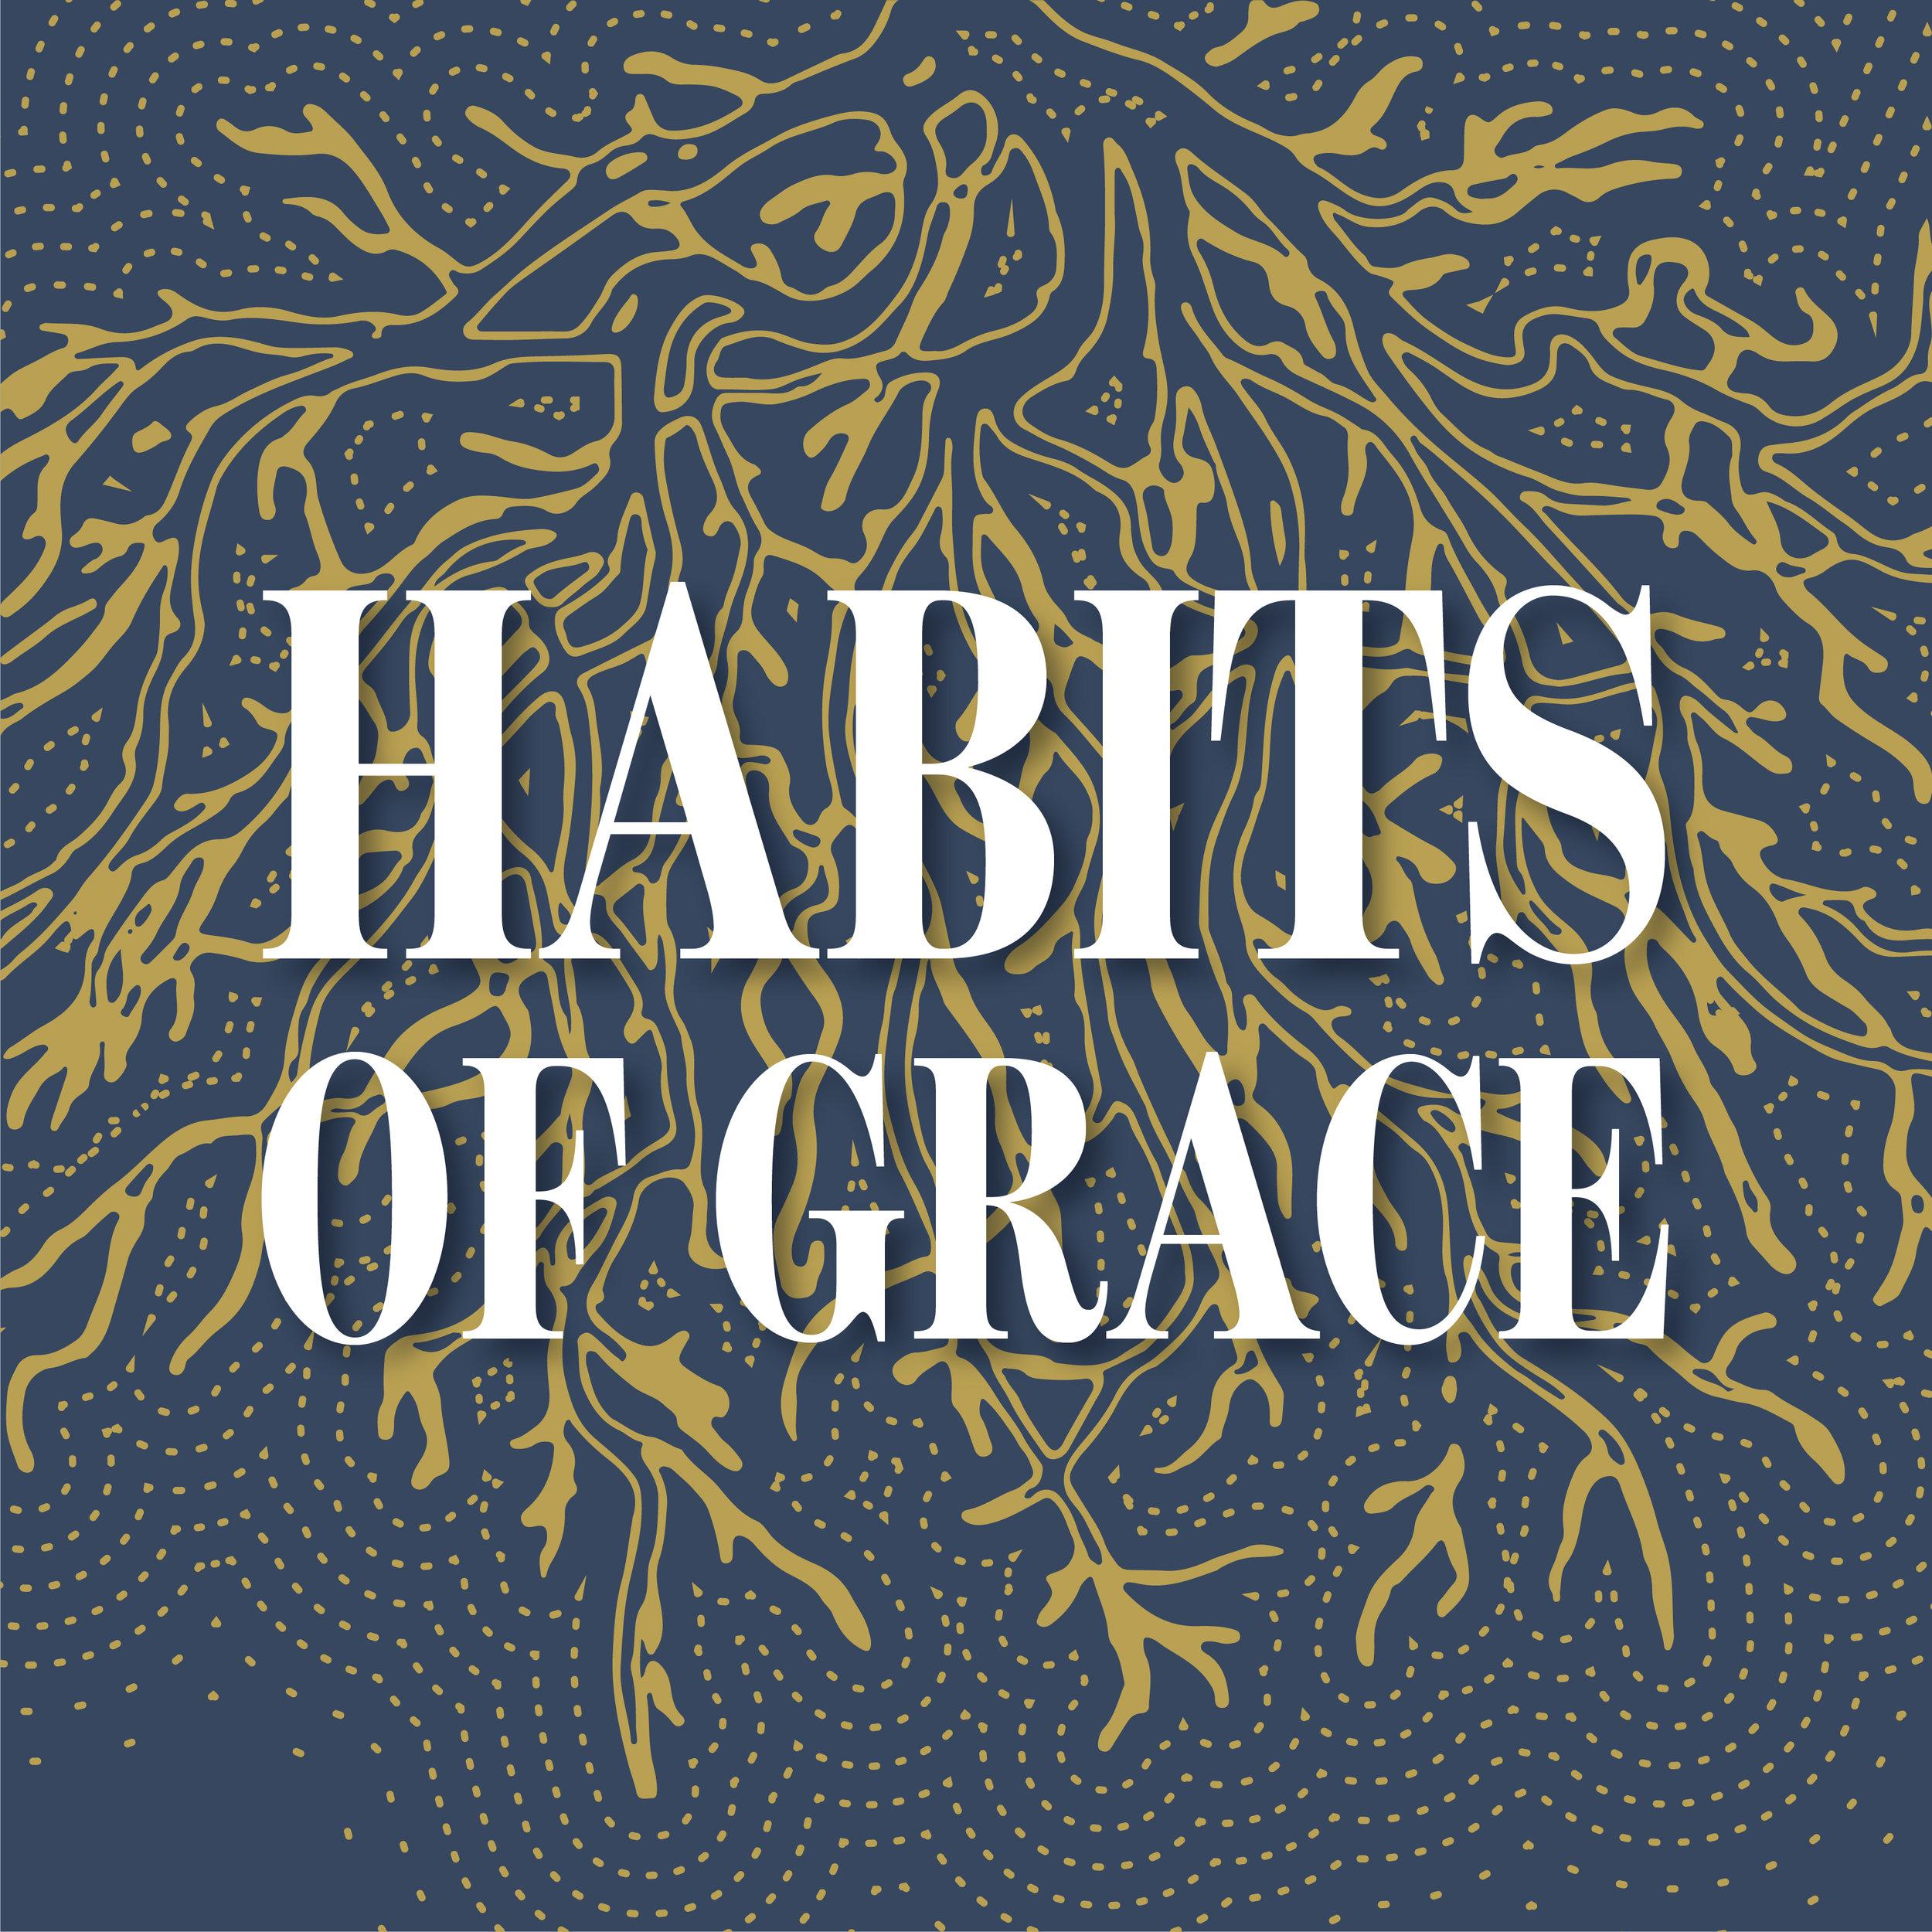 habits of grace square-05.jpg